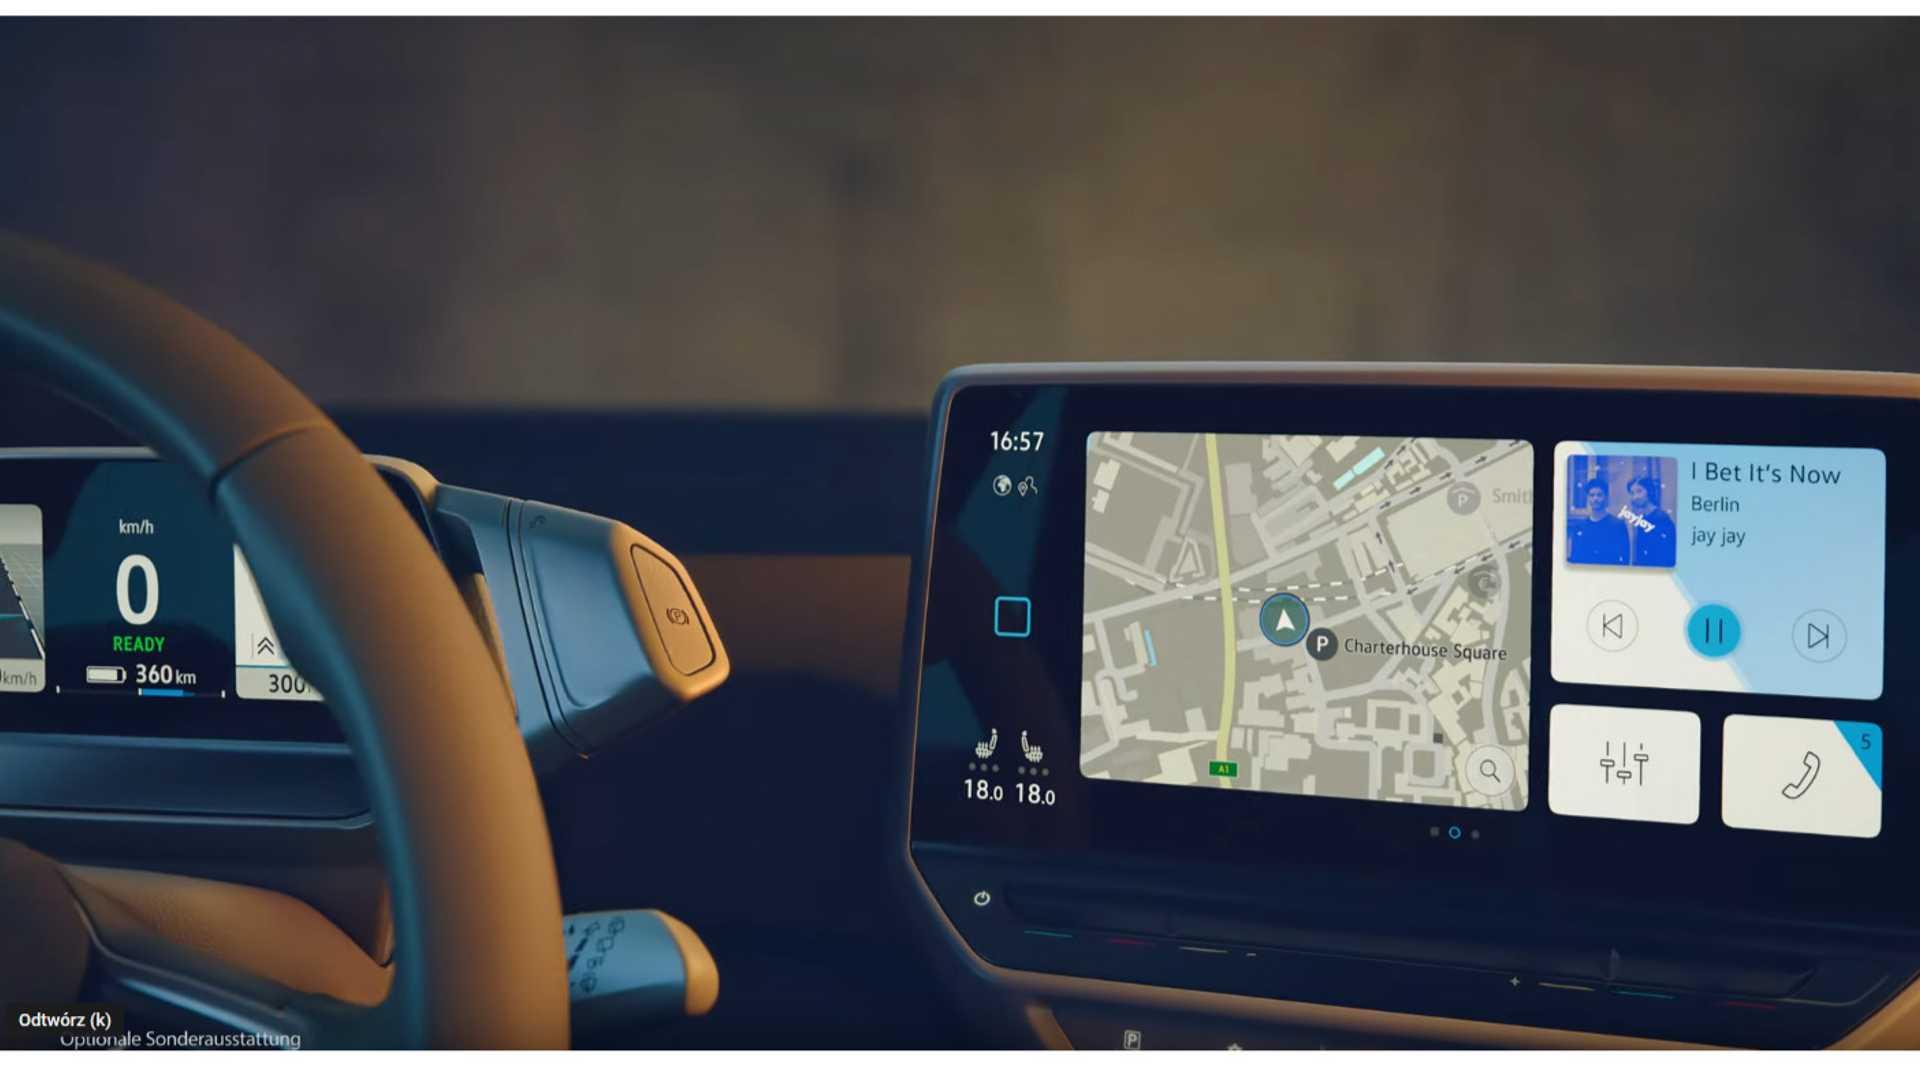 volkswagen-id-3-dashboard-teaser.jpg